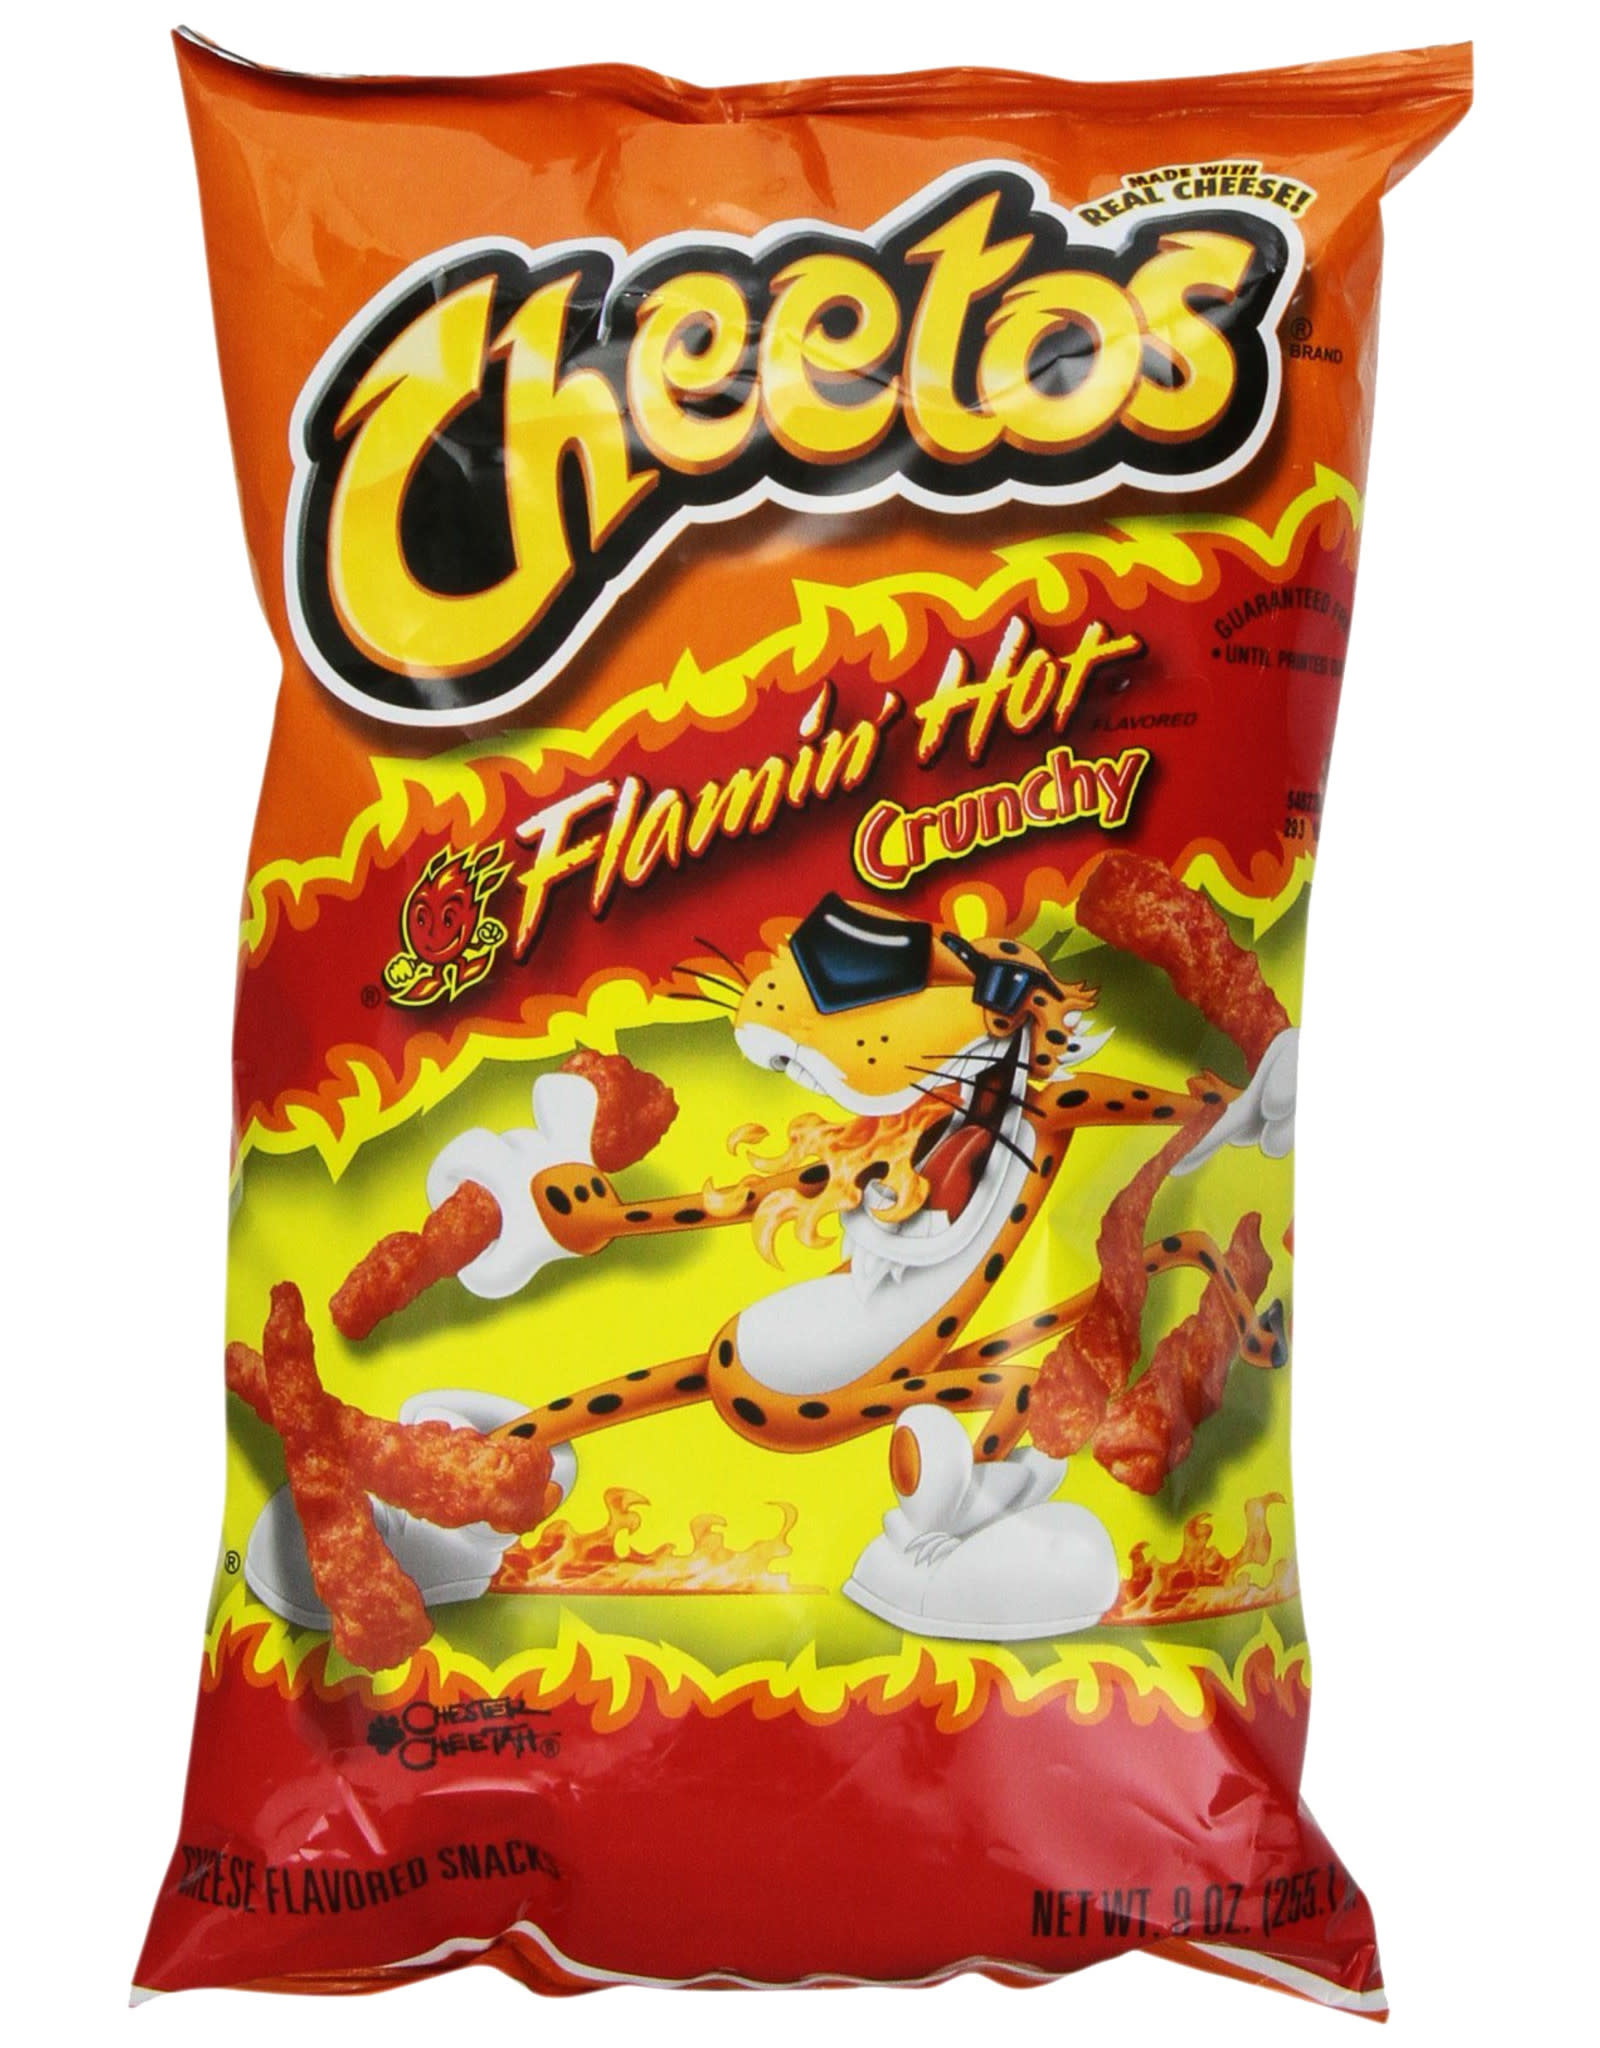 Cheetos Crunchy Flamin' Hot - Groot - 226g